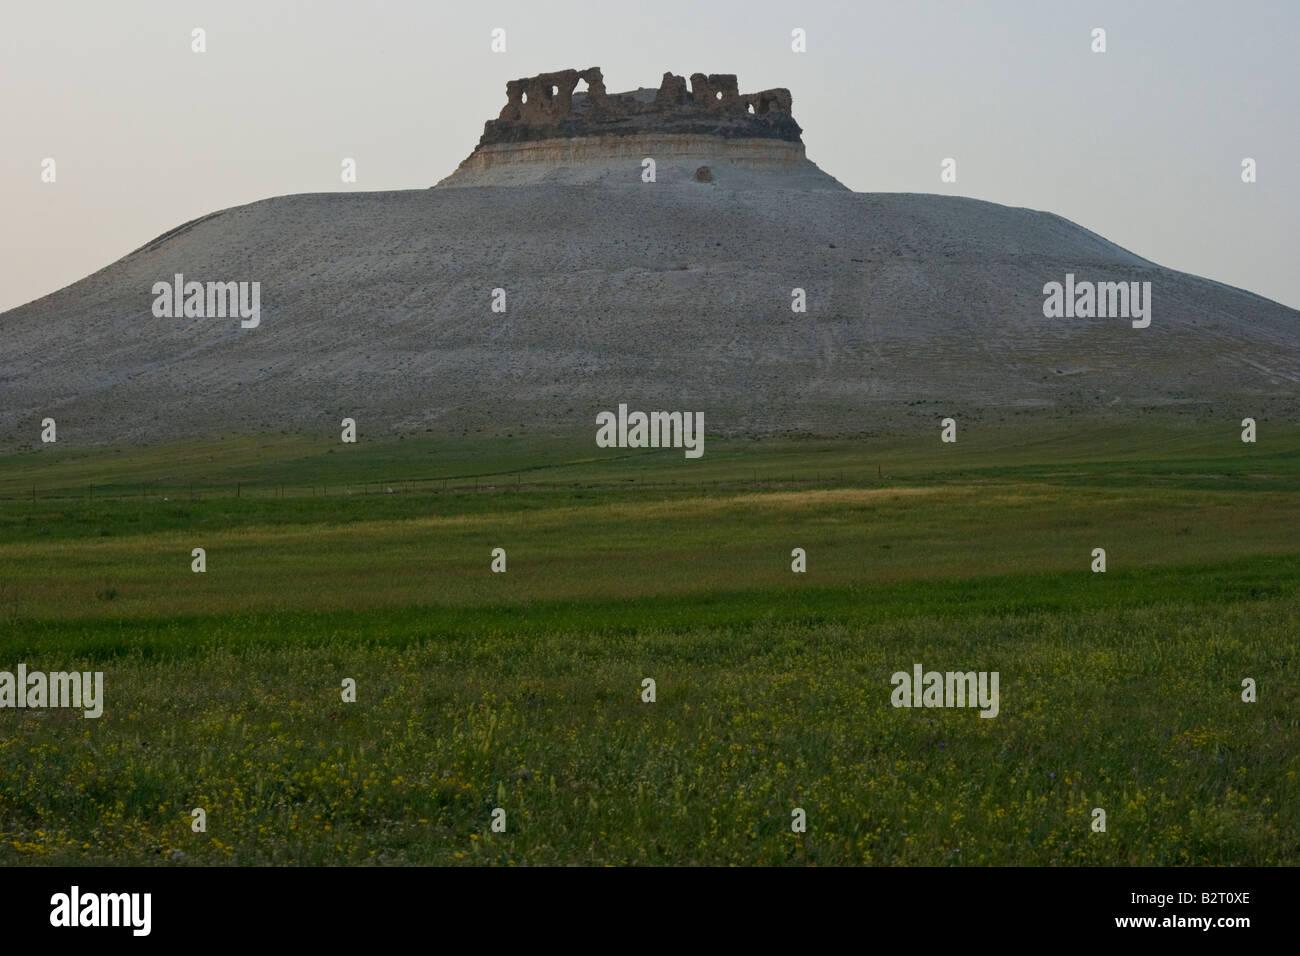 Qalaat Shmaimis an Arab Castle Ruin in Syria - Stock Image